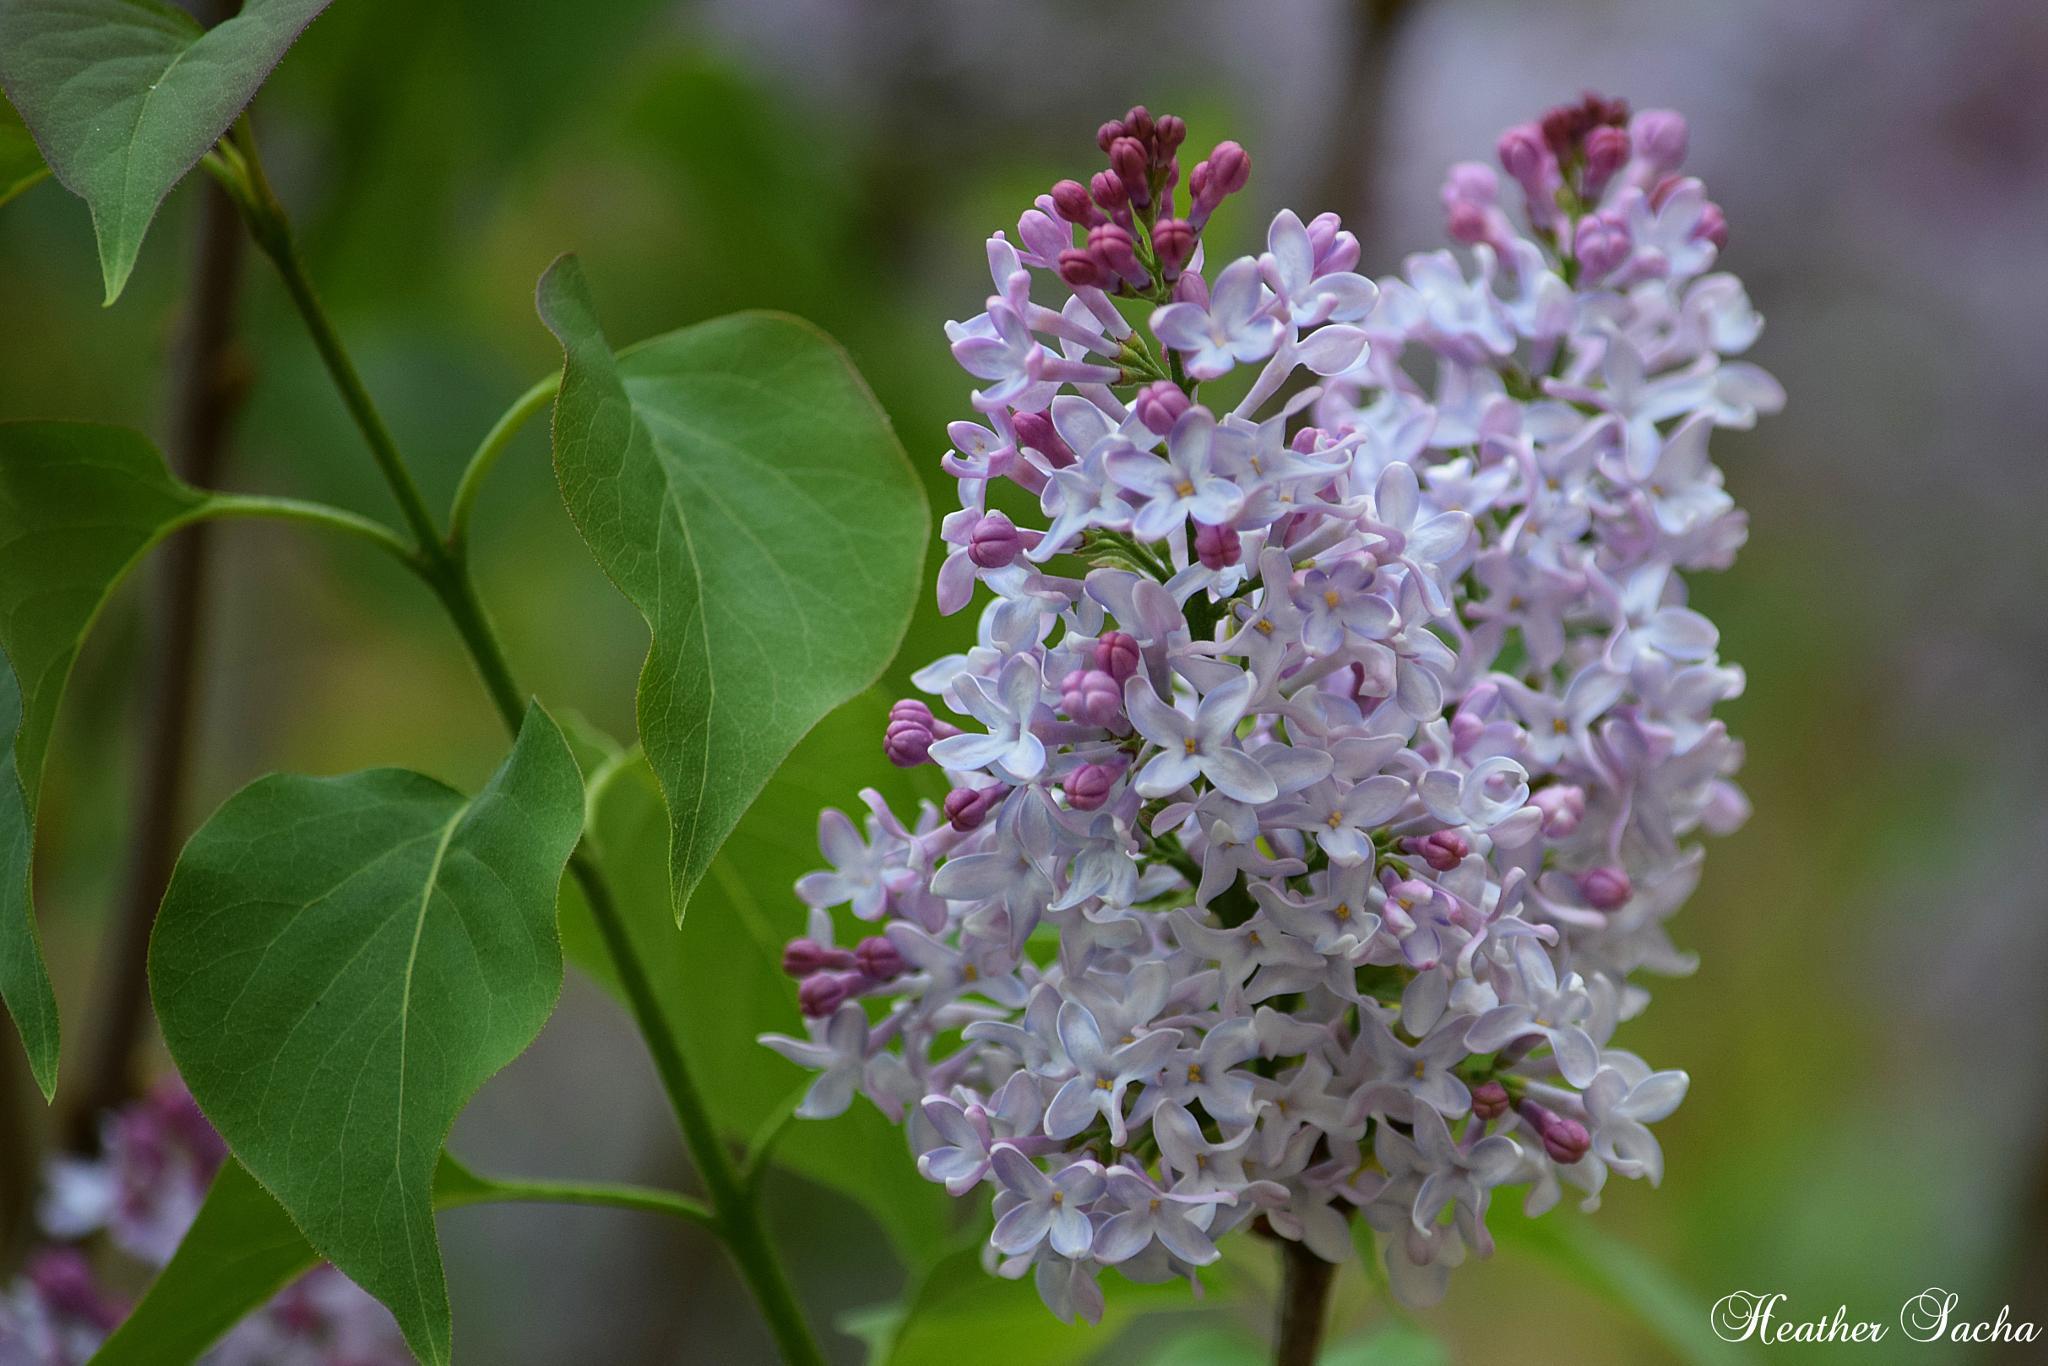 Lilac by heather.sacha